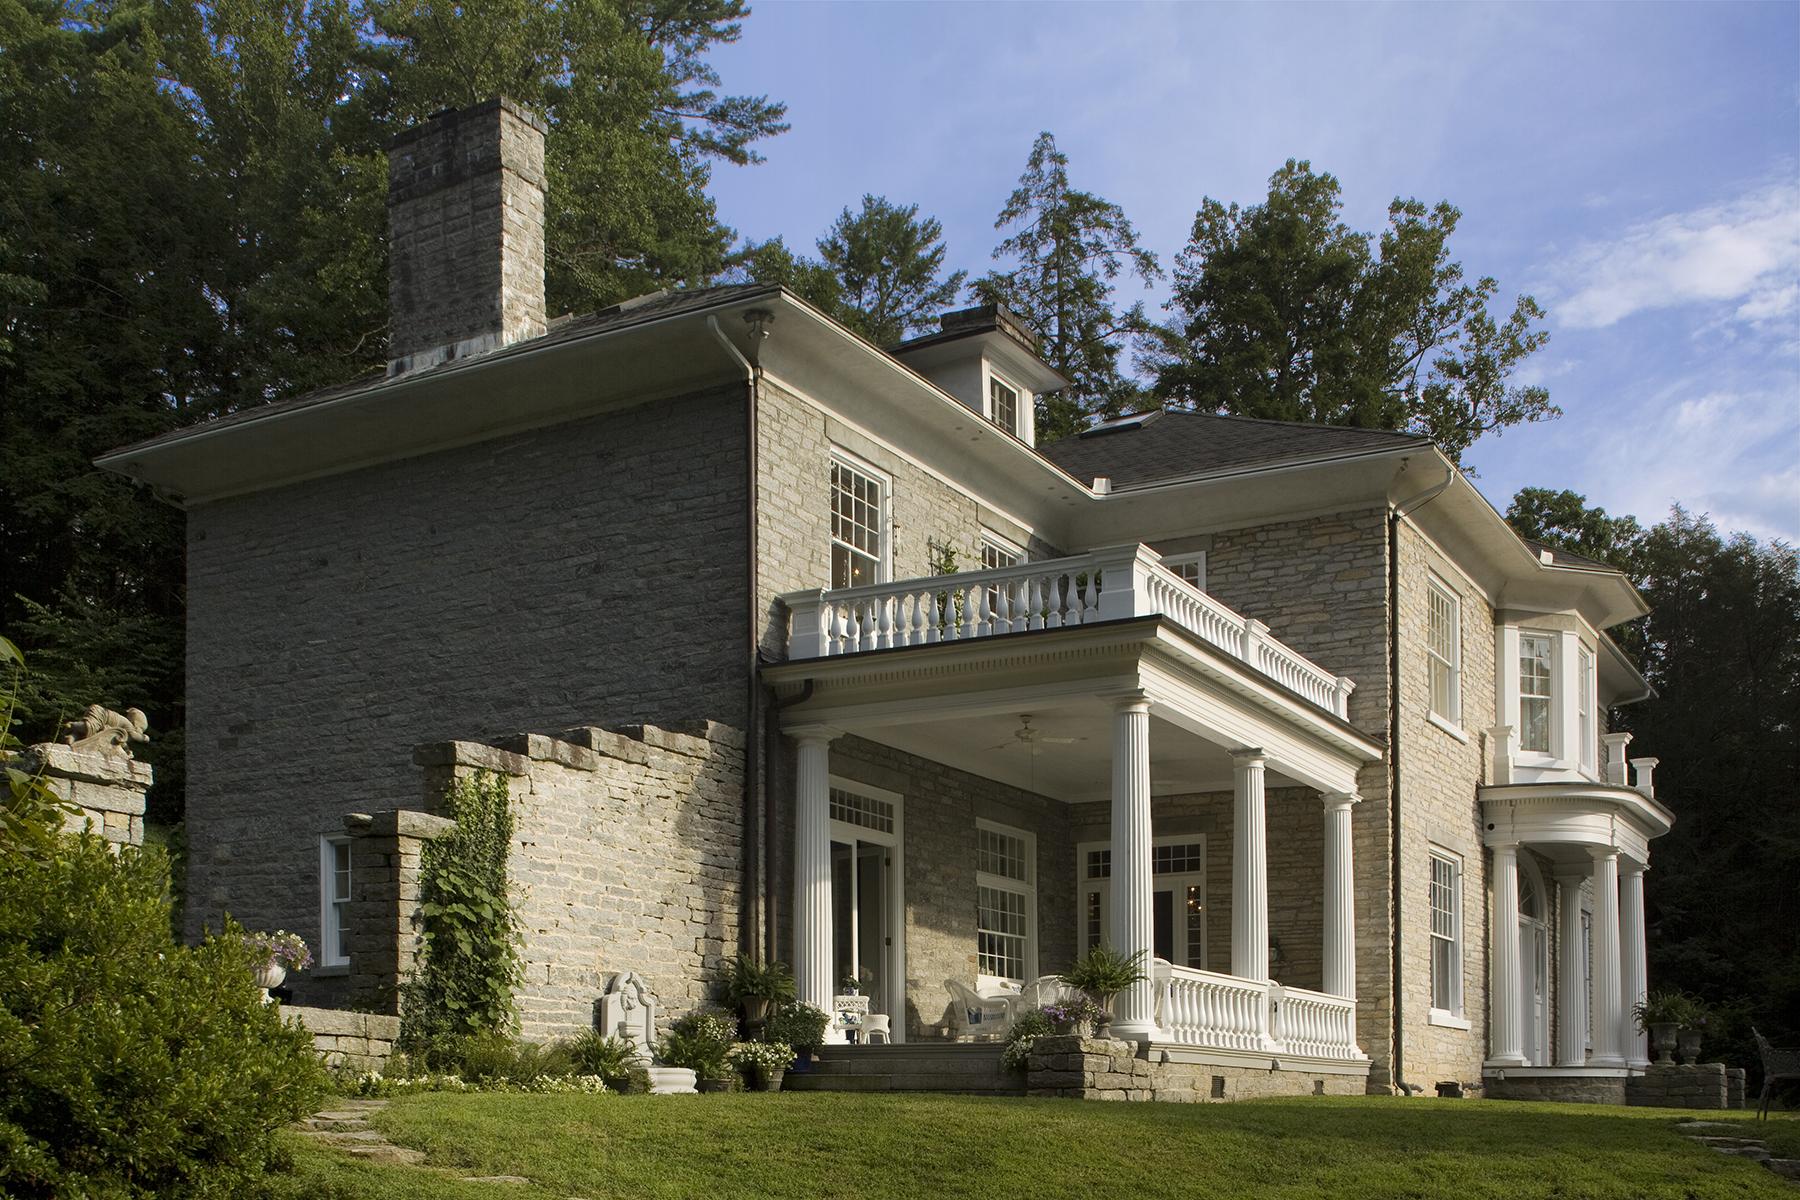 Single Family Home for Sale at 1001 Estate Dr , Chanteloup, Flat Rock, NC 28739 1001 Estate Dr Chanteloup Flat Rock, North Carolina, 28739 United States